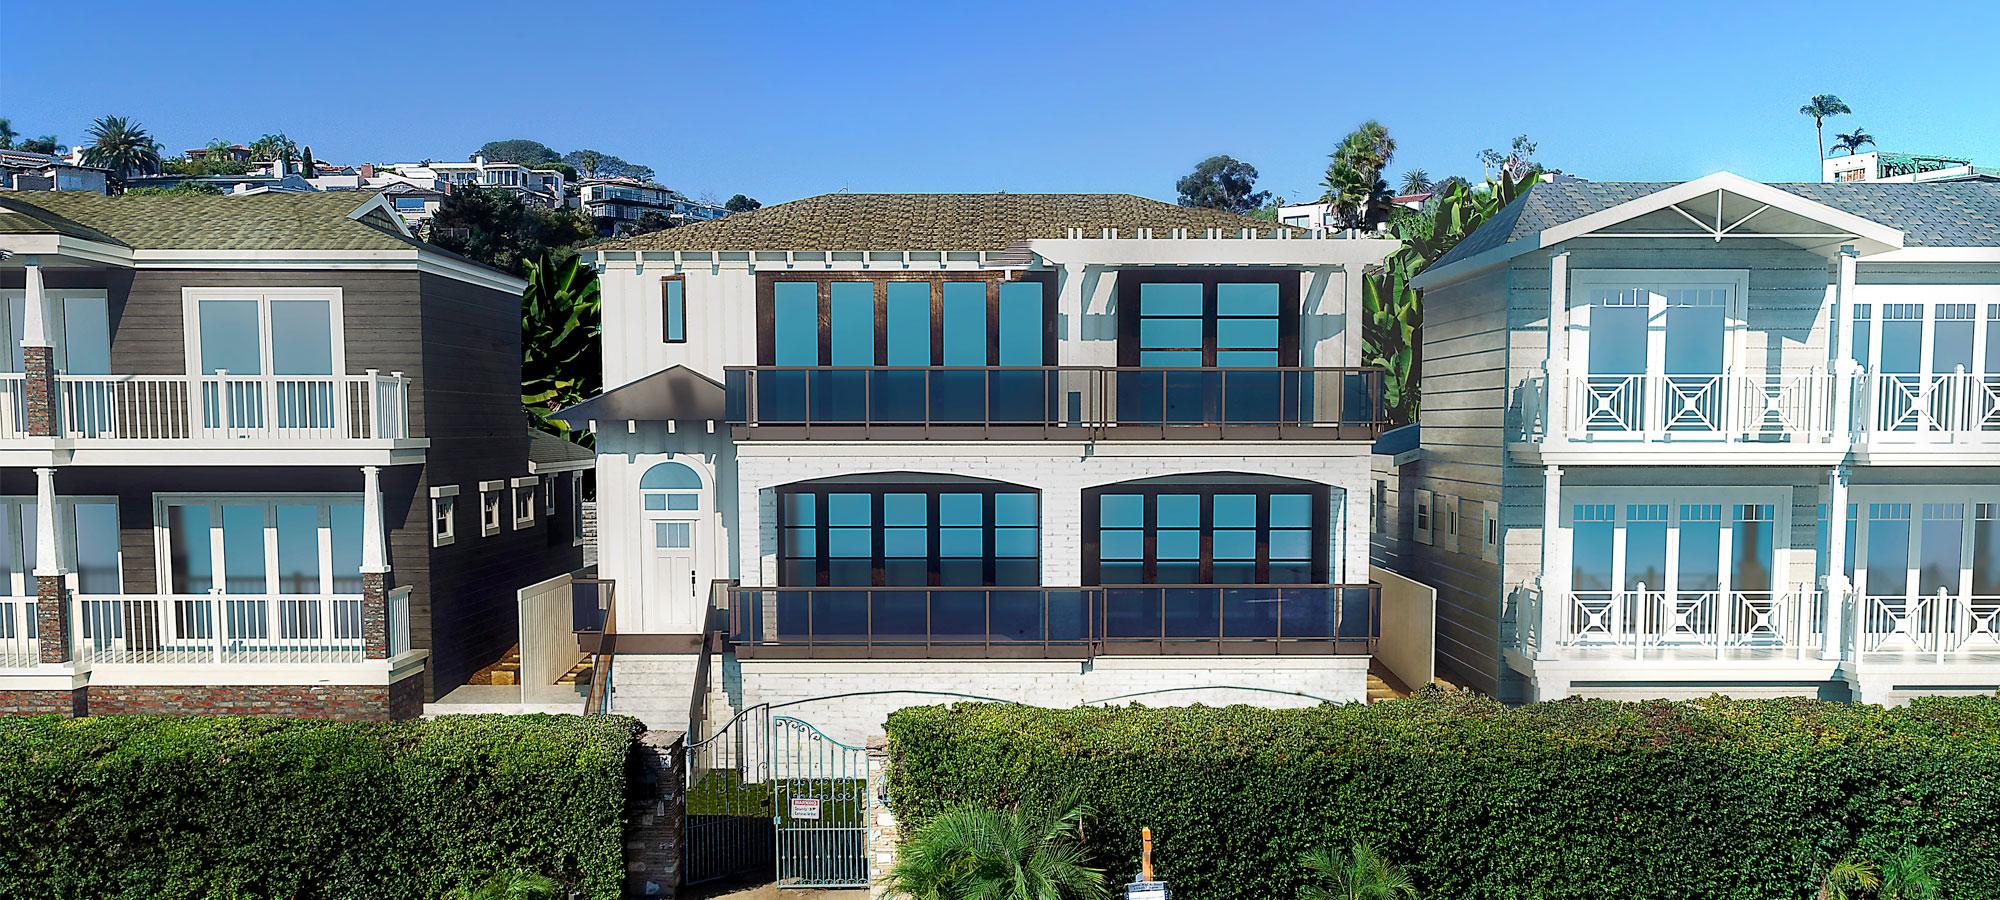 1010 Evergreen St, San Diego, CA 92106